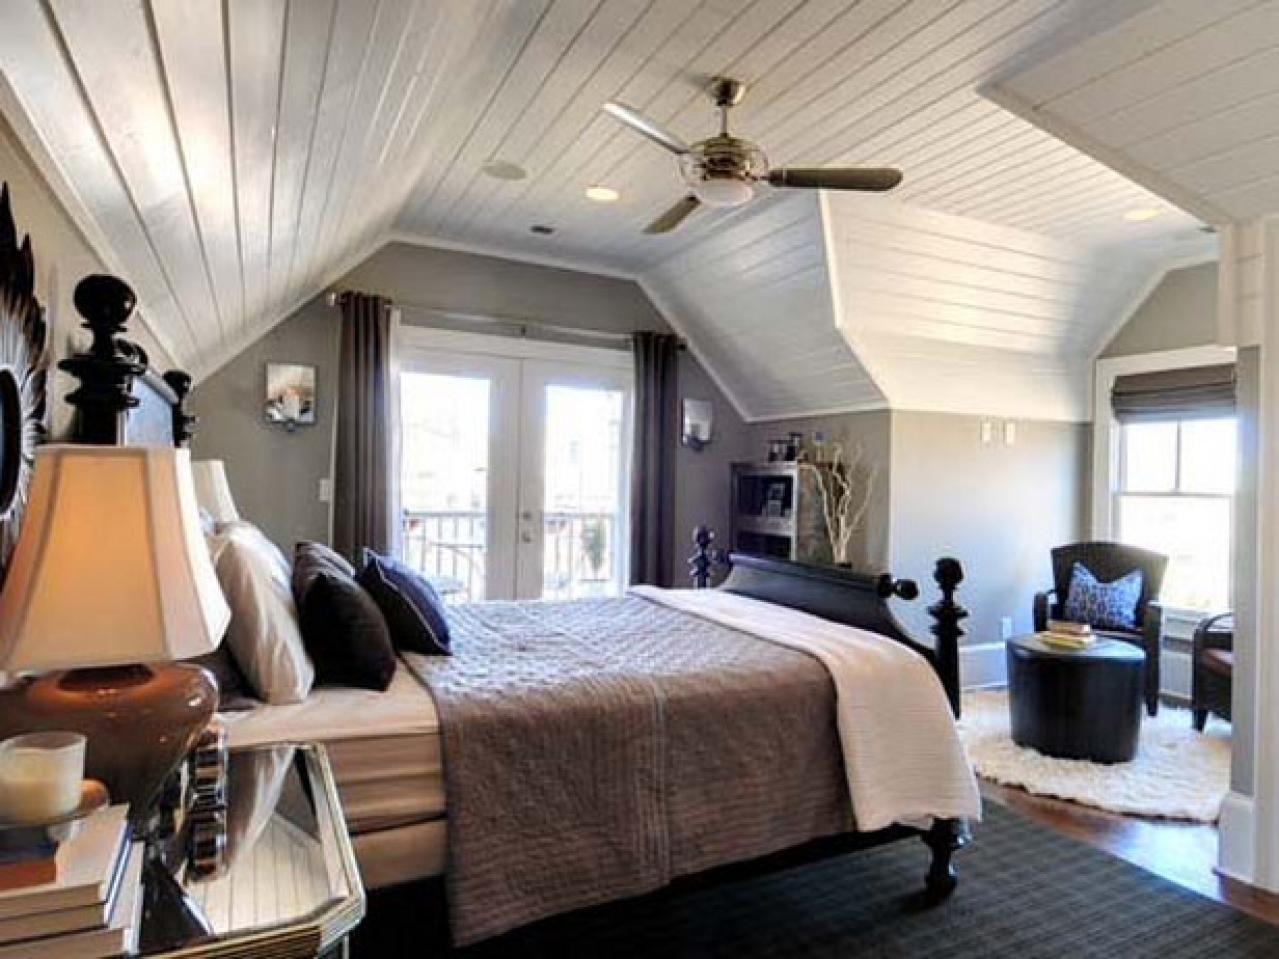 16 Amazing Attic Remodels In 2020 Remodel Bedroom Attic Master Bedroom Attic Remodel